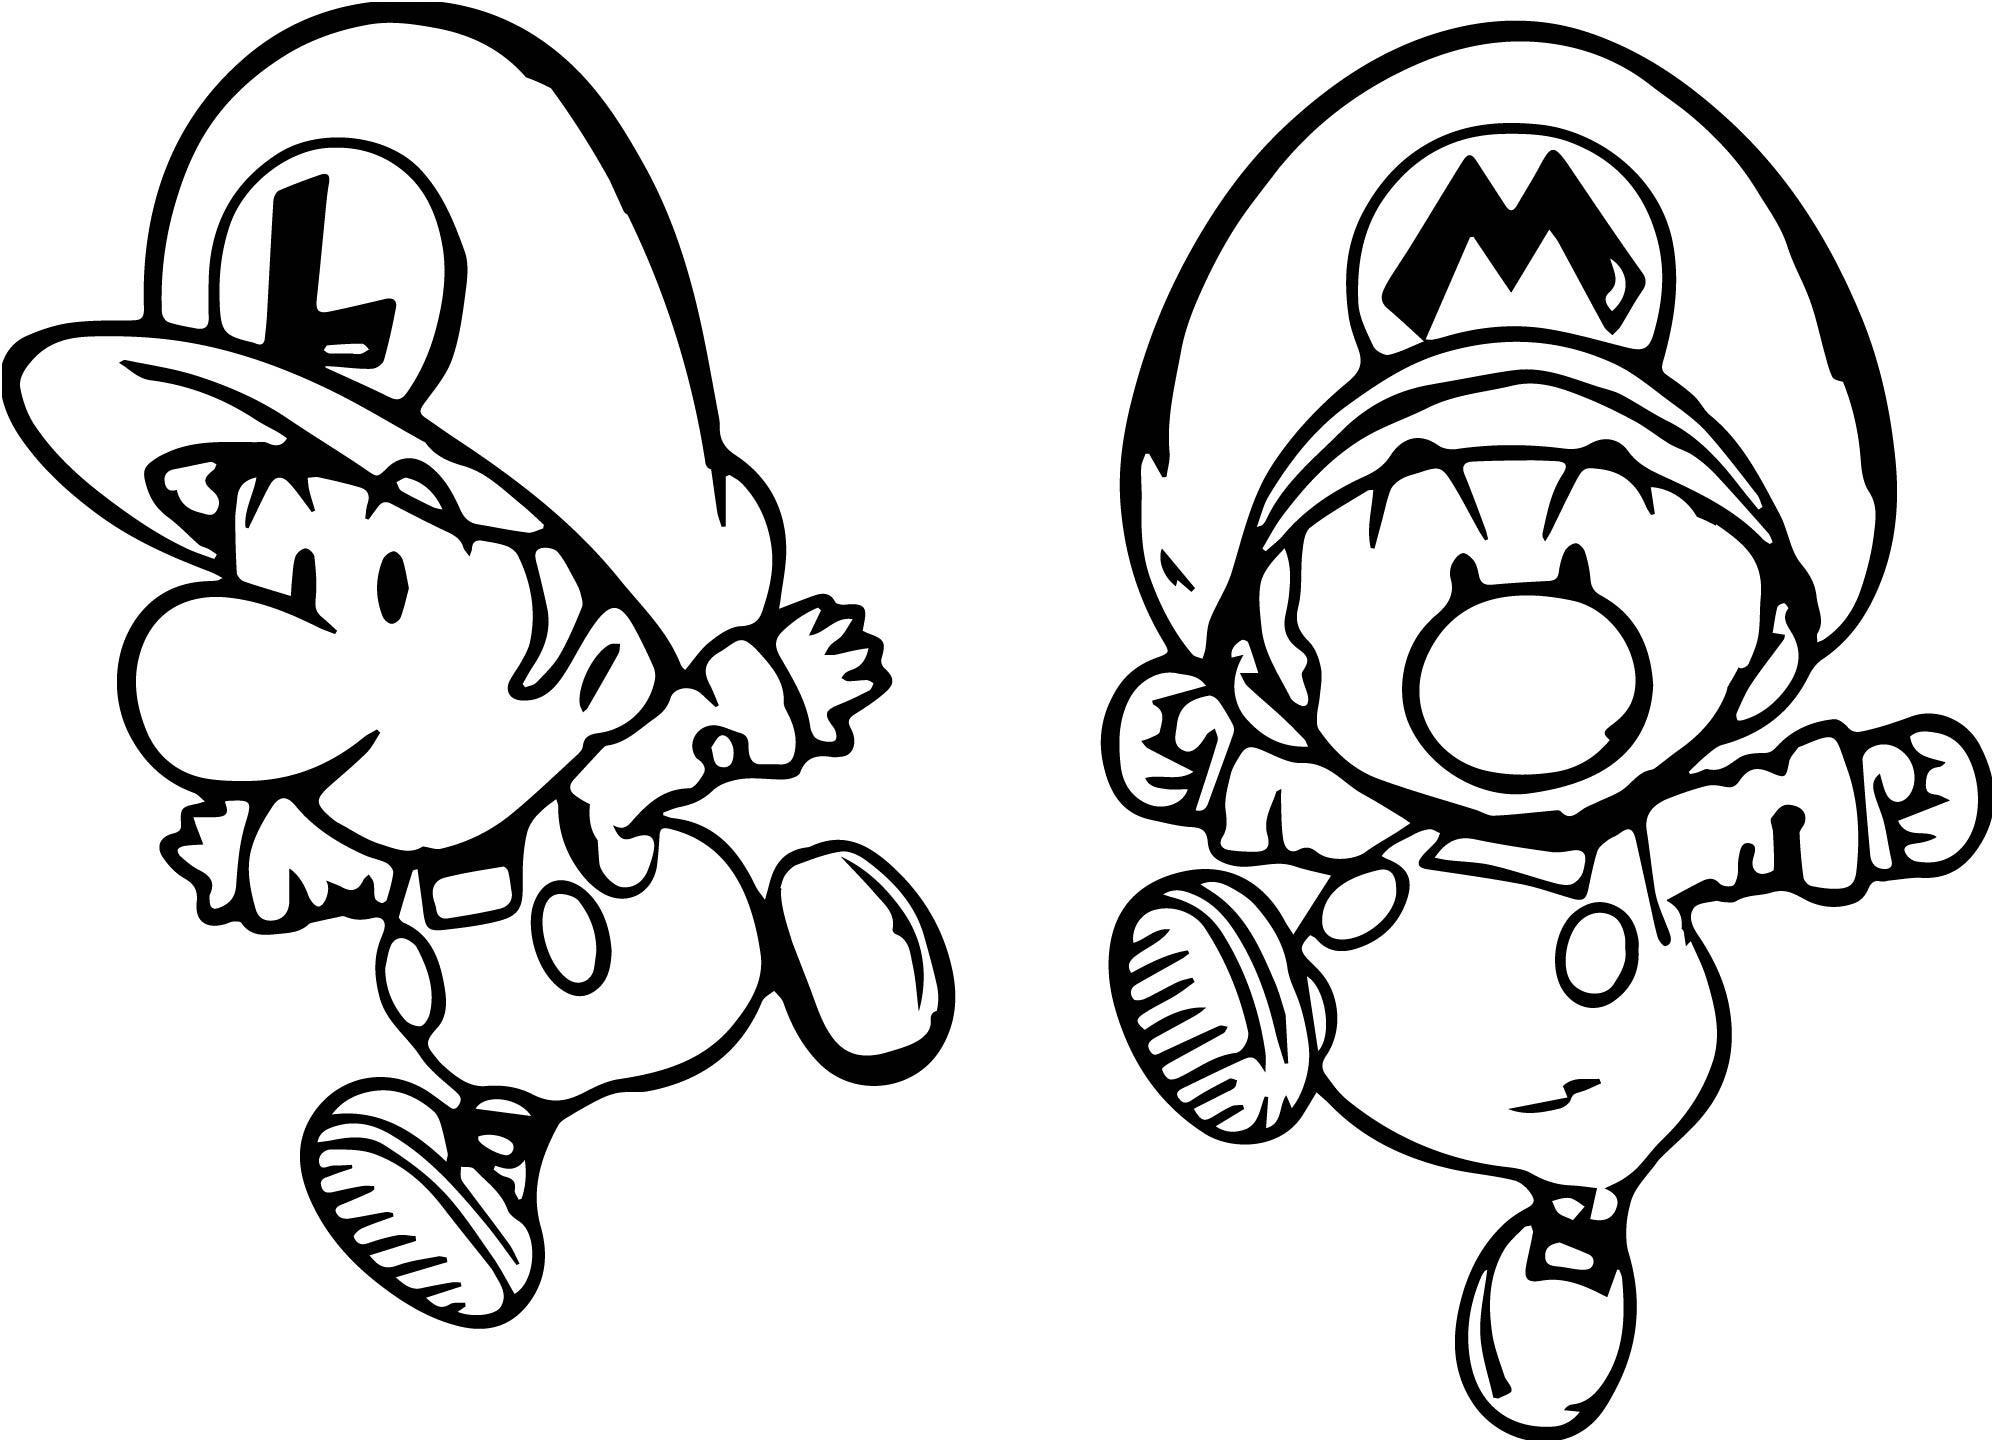 Coloriage A Imprimer De Mario Et Peach Coloriage Imprimer